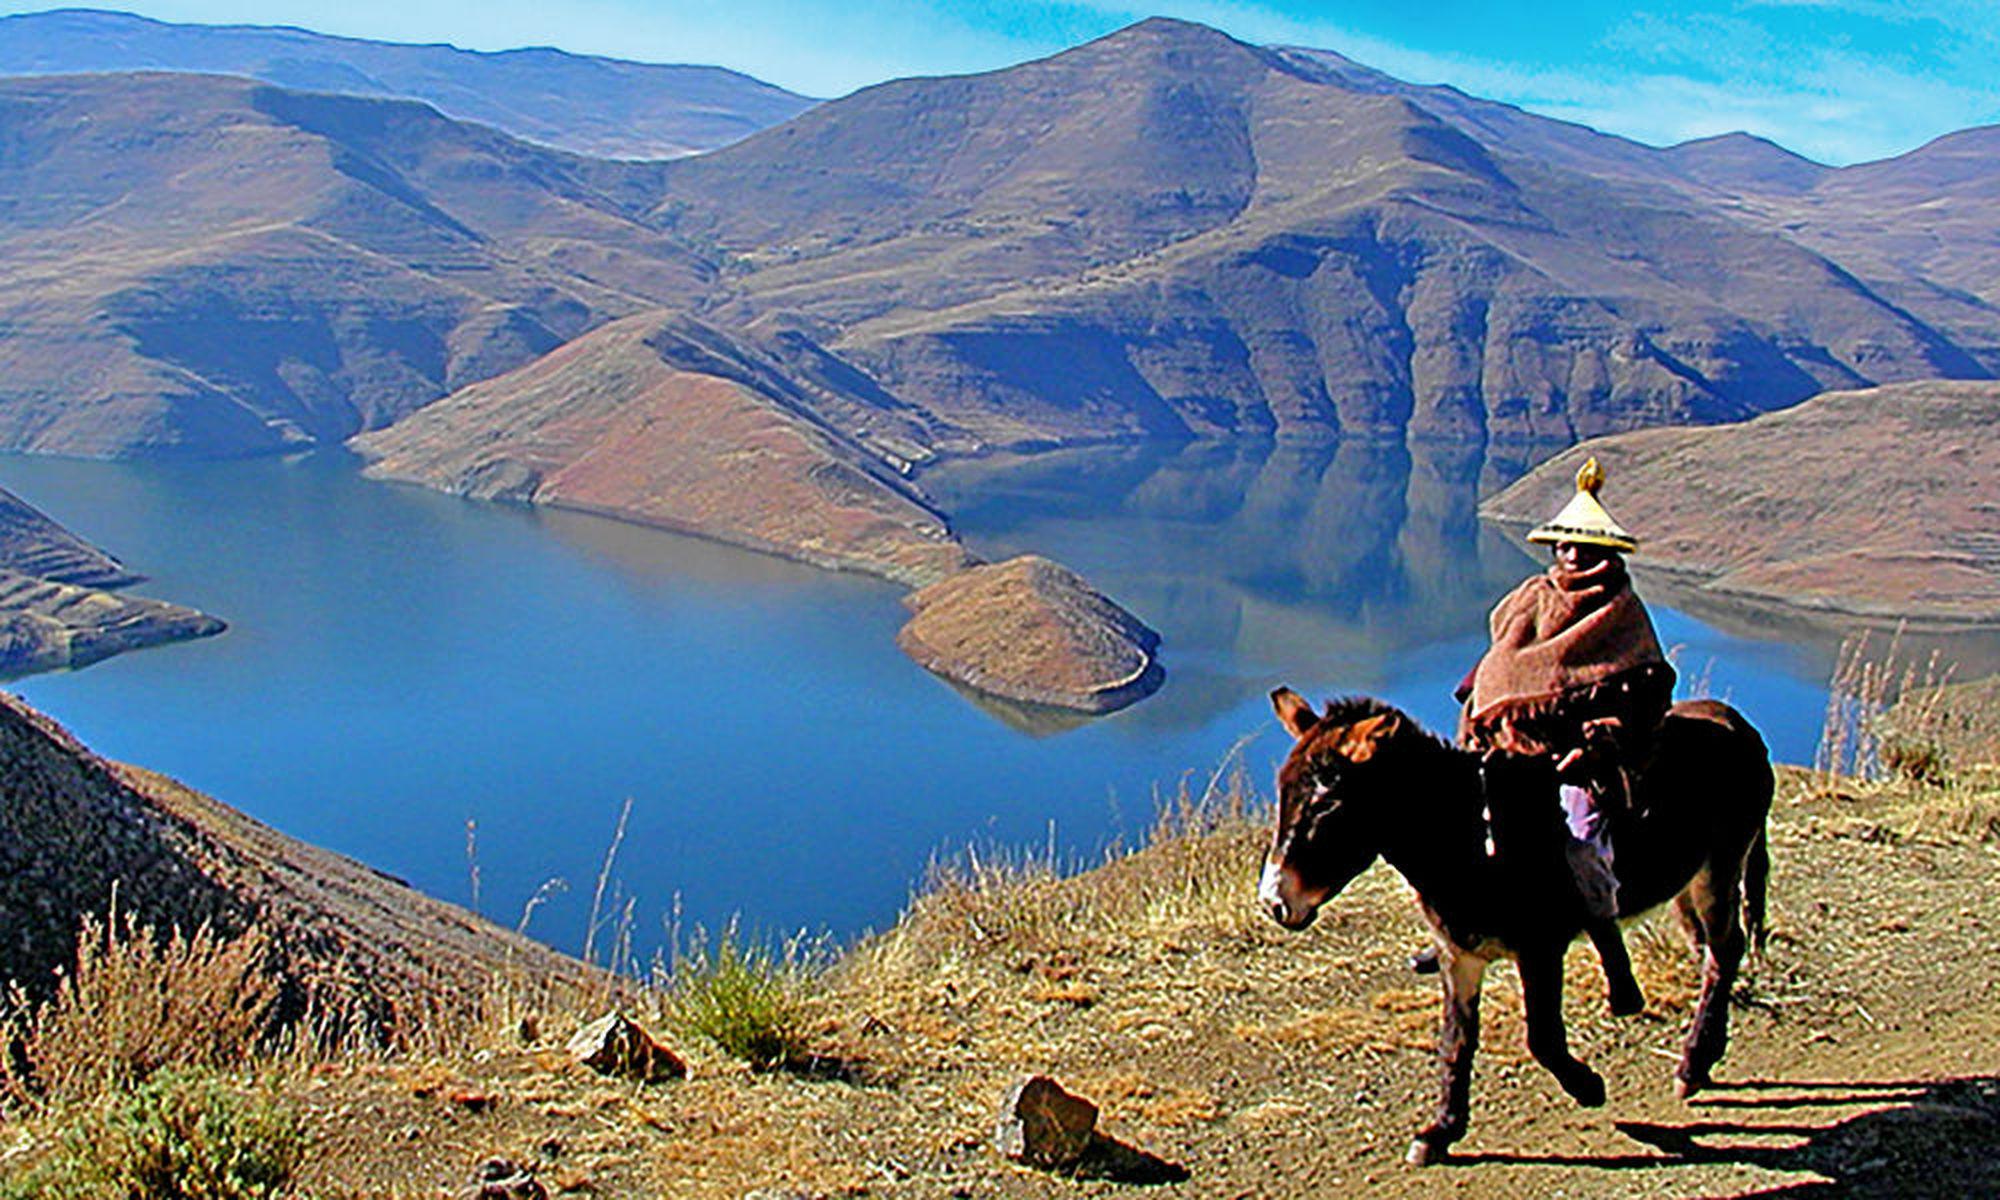 Lesotho images